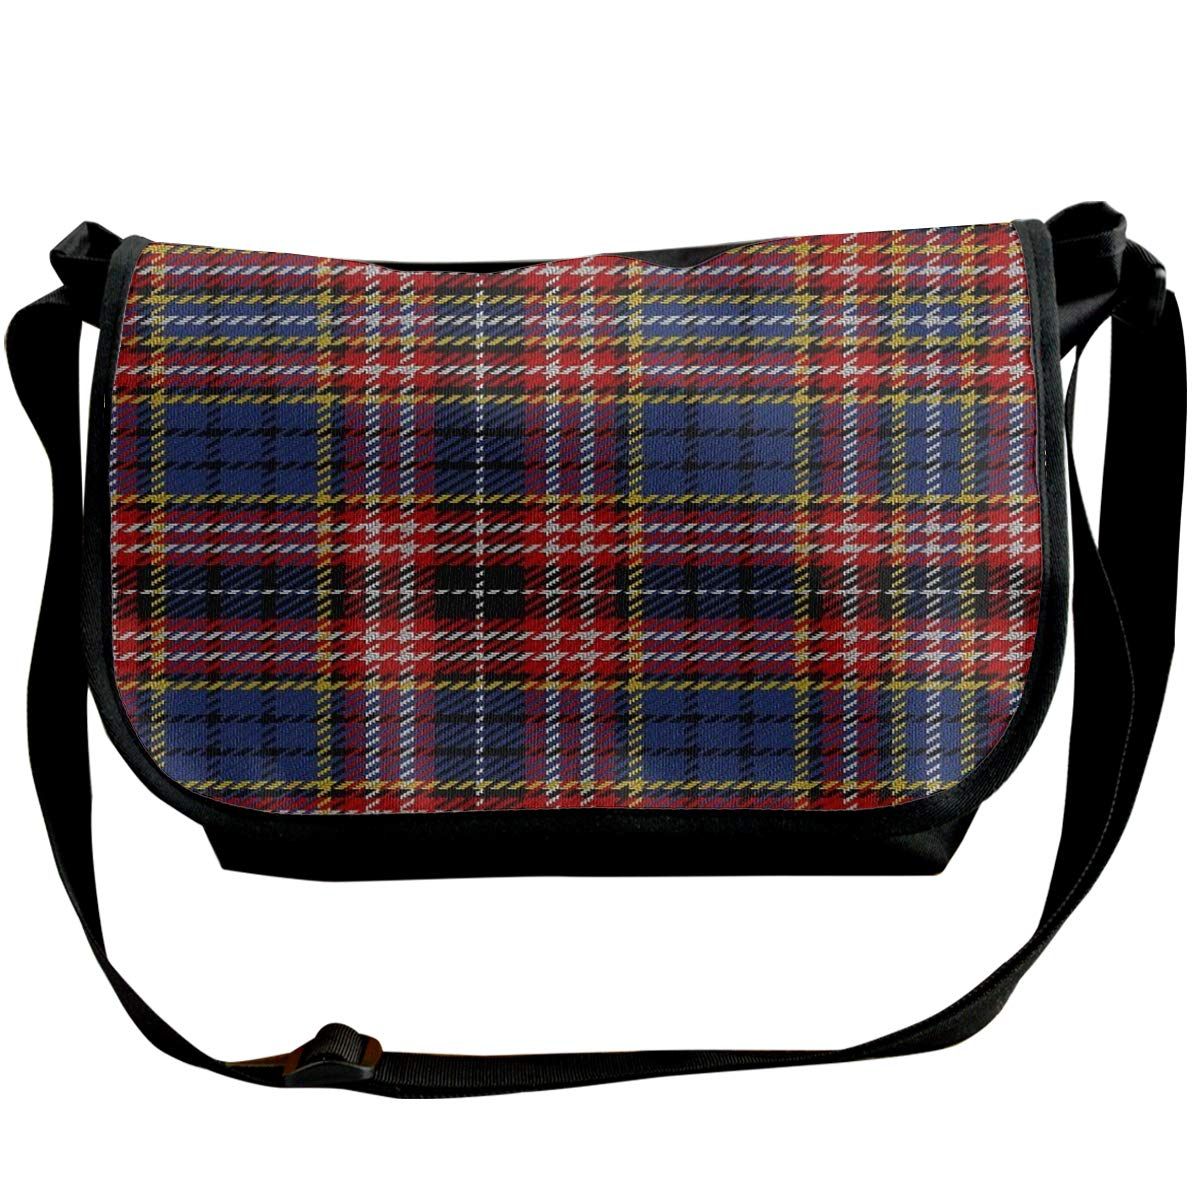 Futong Huaxia Classic Scottish Plaid Travel Messenger Bags Handbag Shoulder Bag Crossbody Bag Unisex